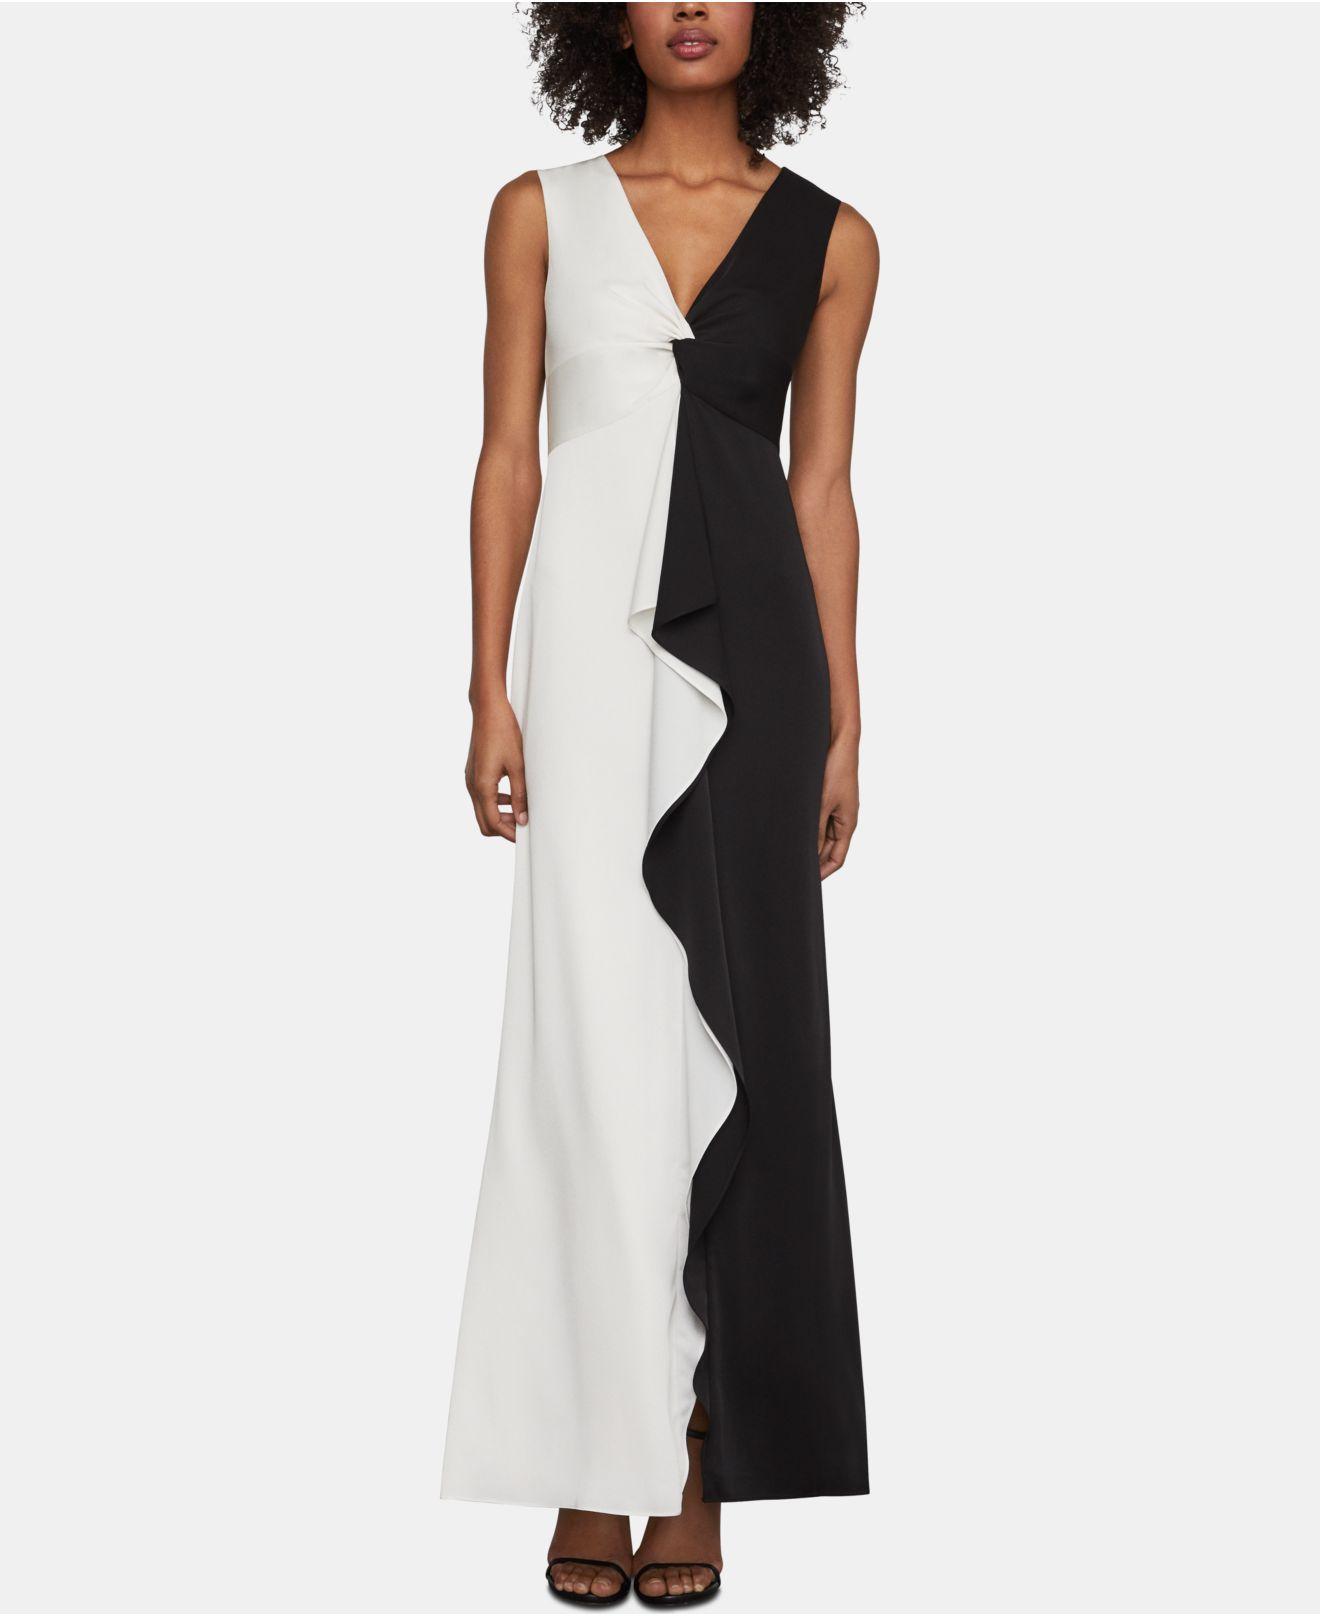 c4c976ffa4 Lyst - BCBGMAXAZRIA Colorblock Twist Front Ruffle Gown in Black